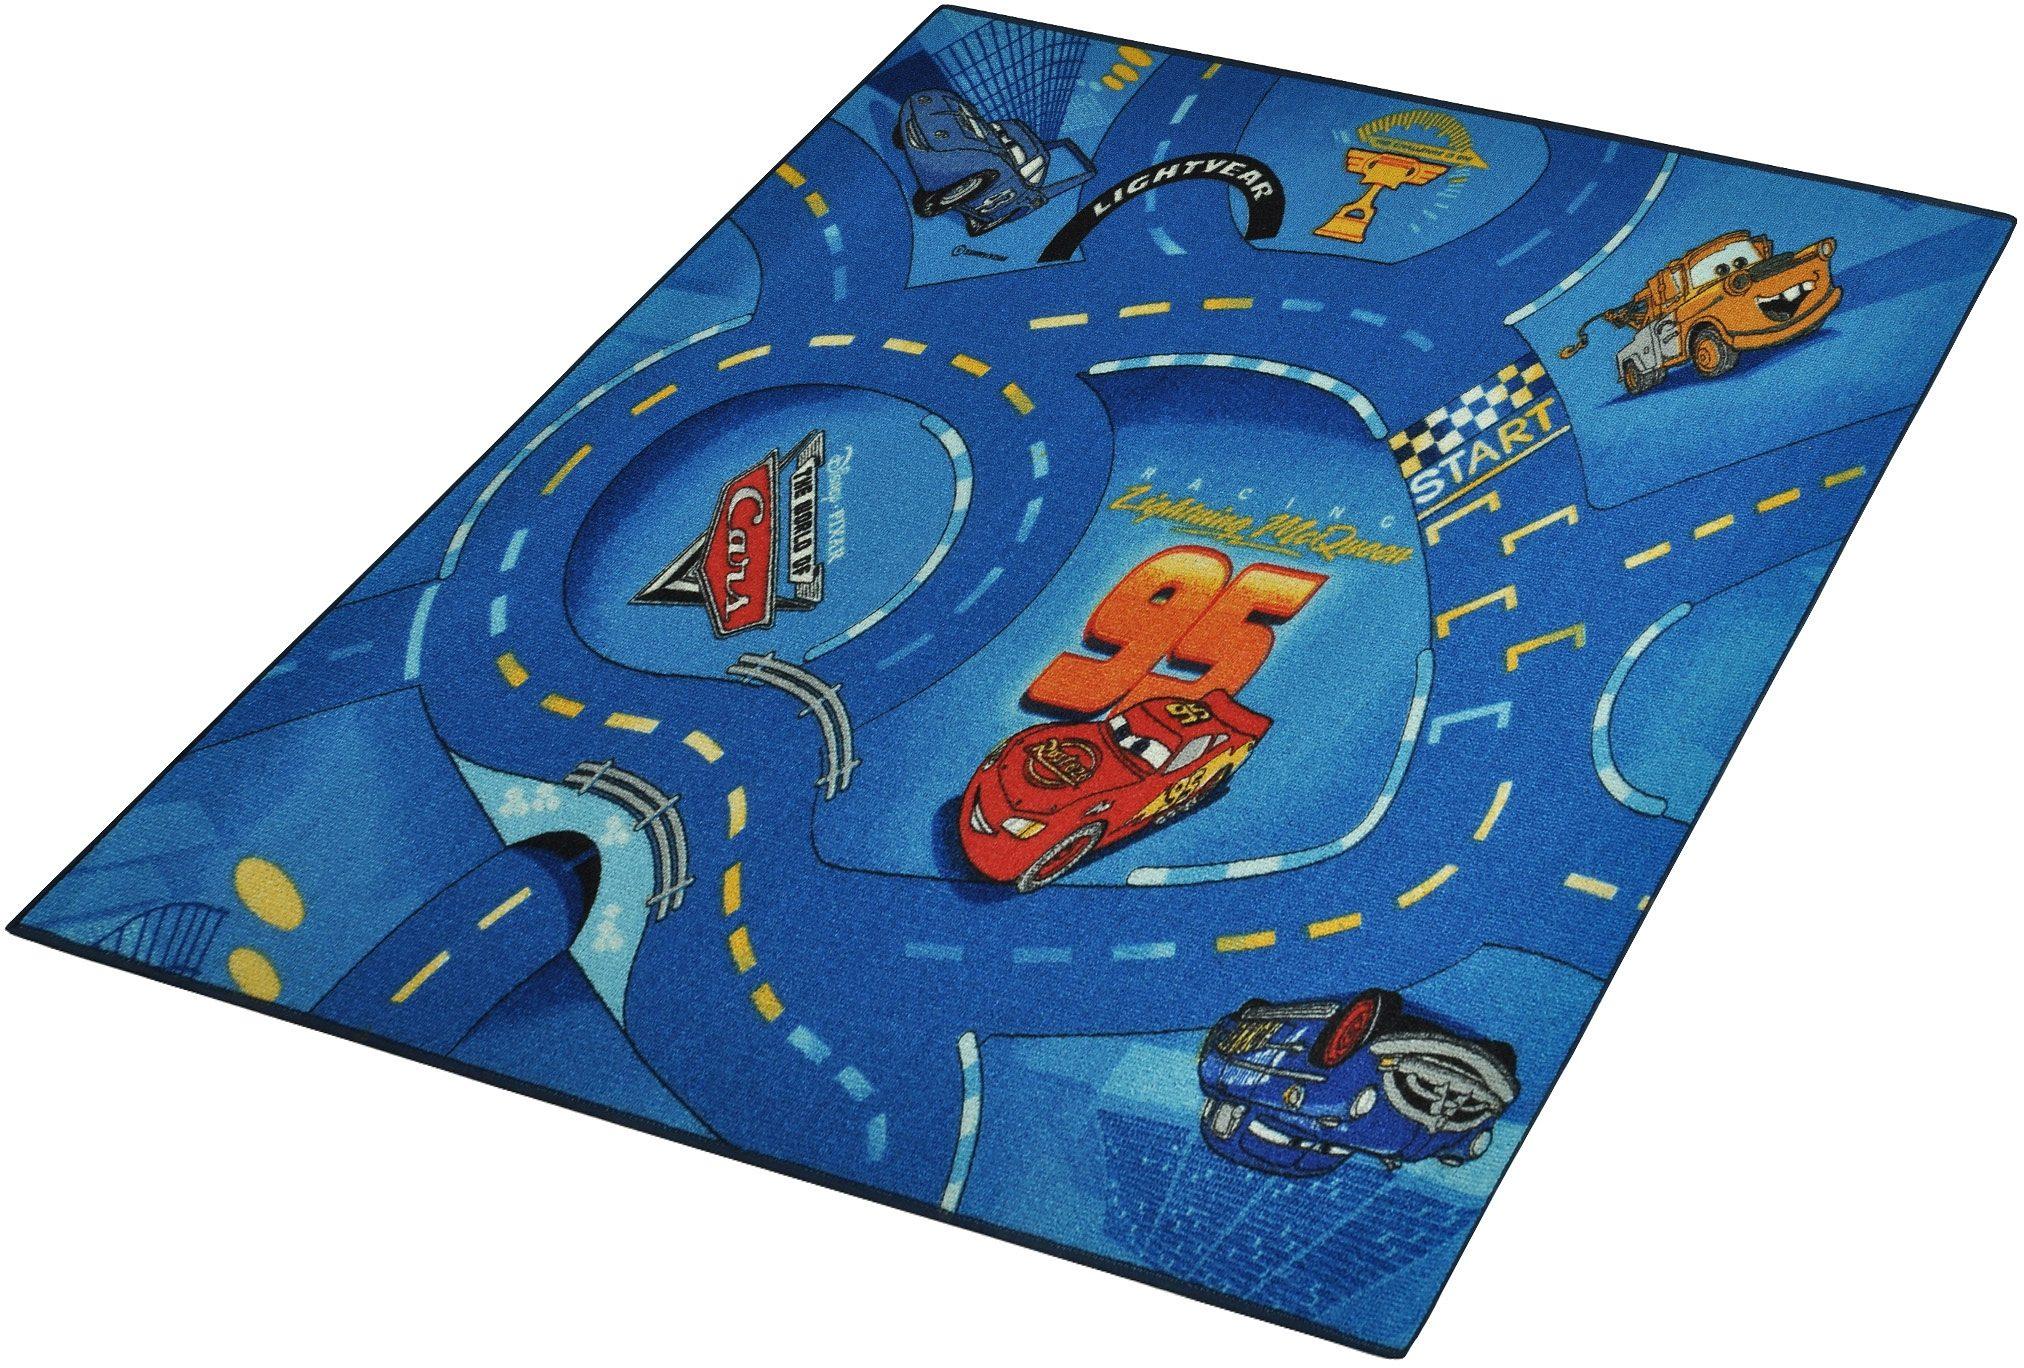 Kinder-Teppich, Disney Lizenz Teppich »CARS«, getuftet